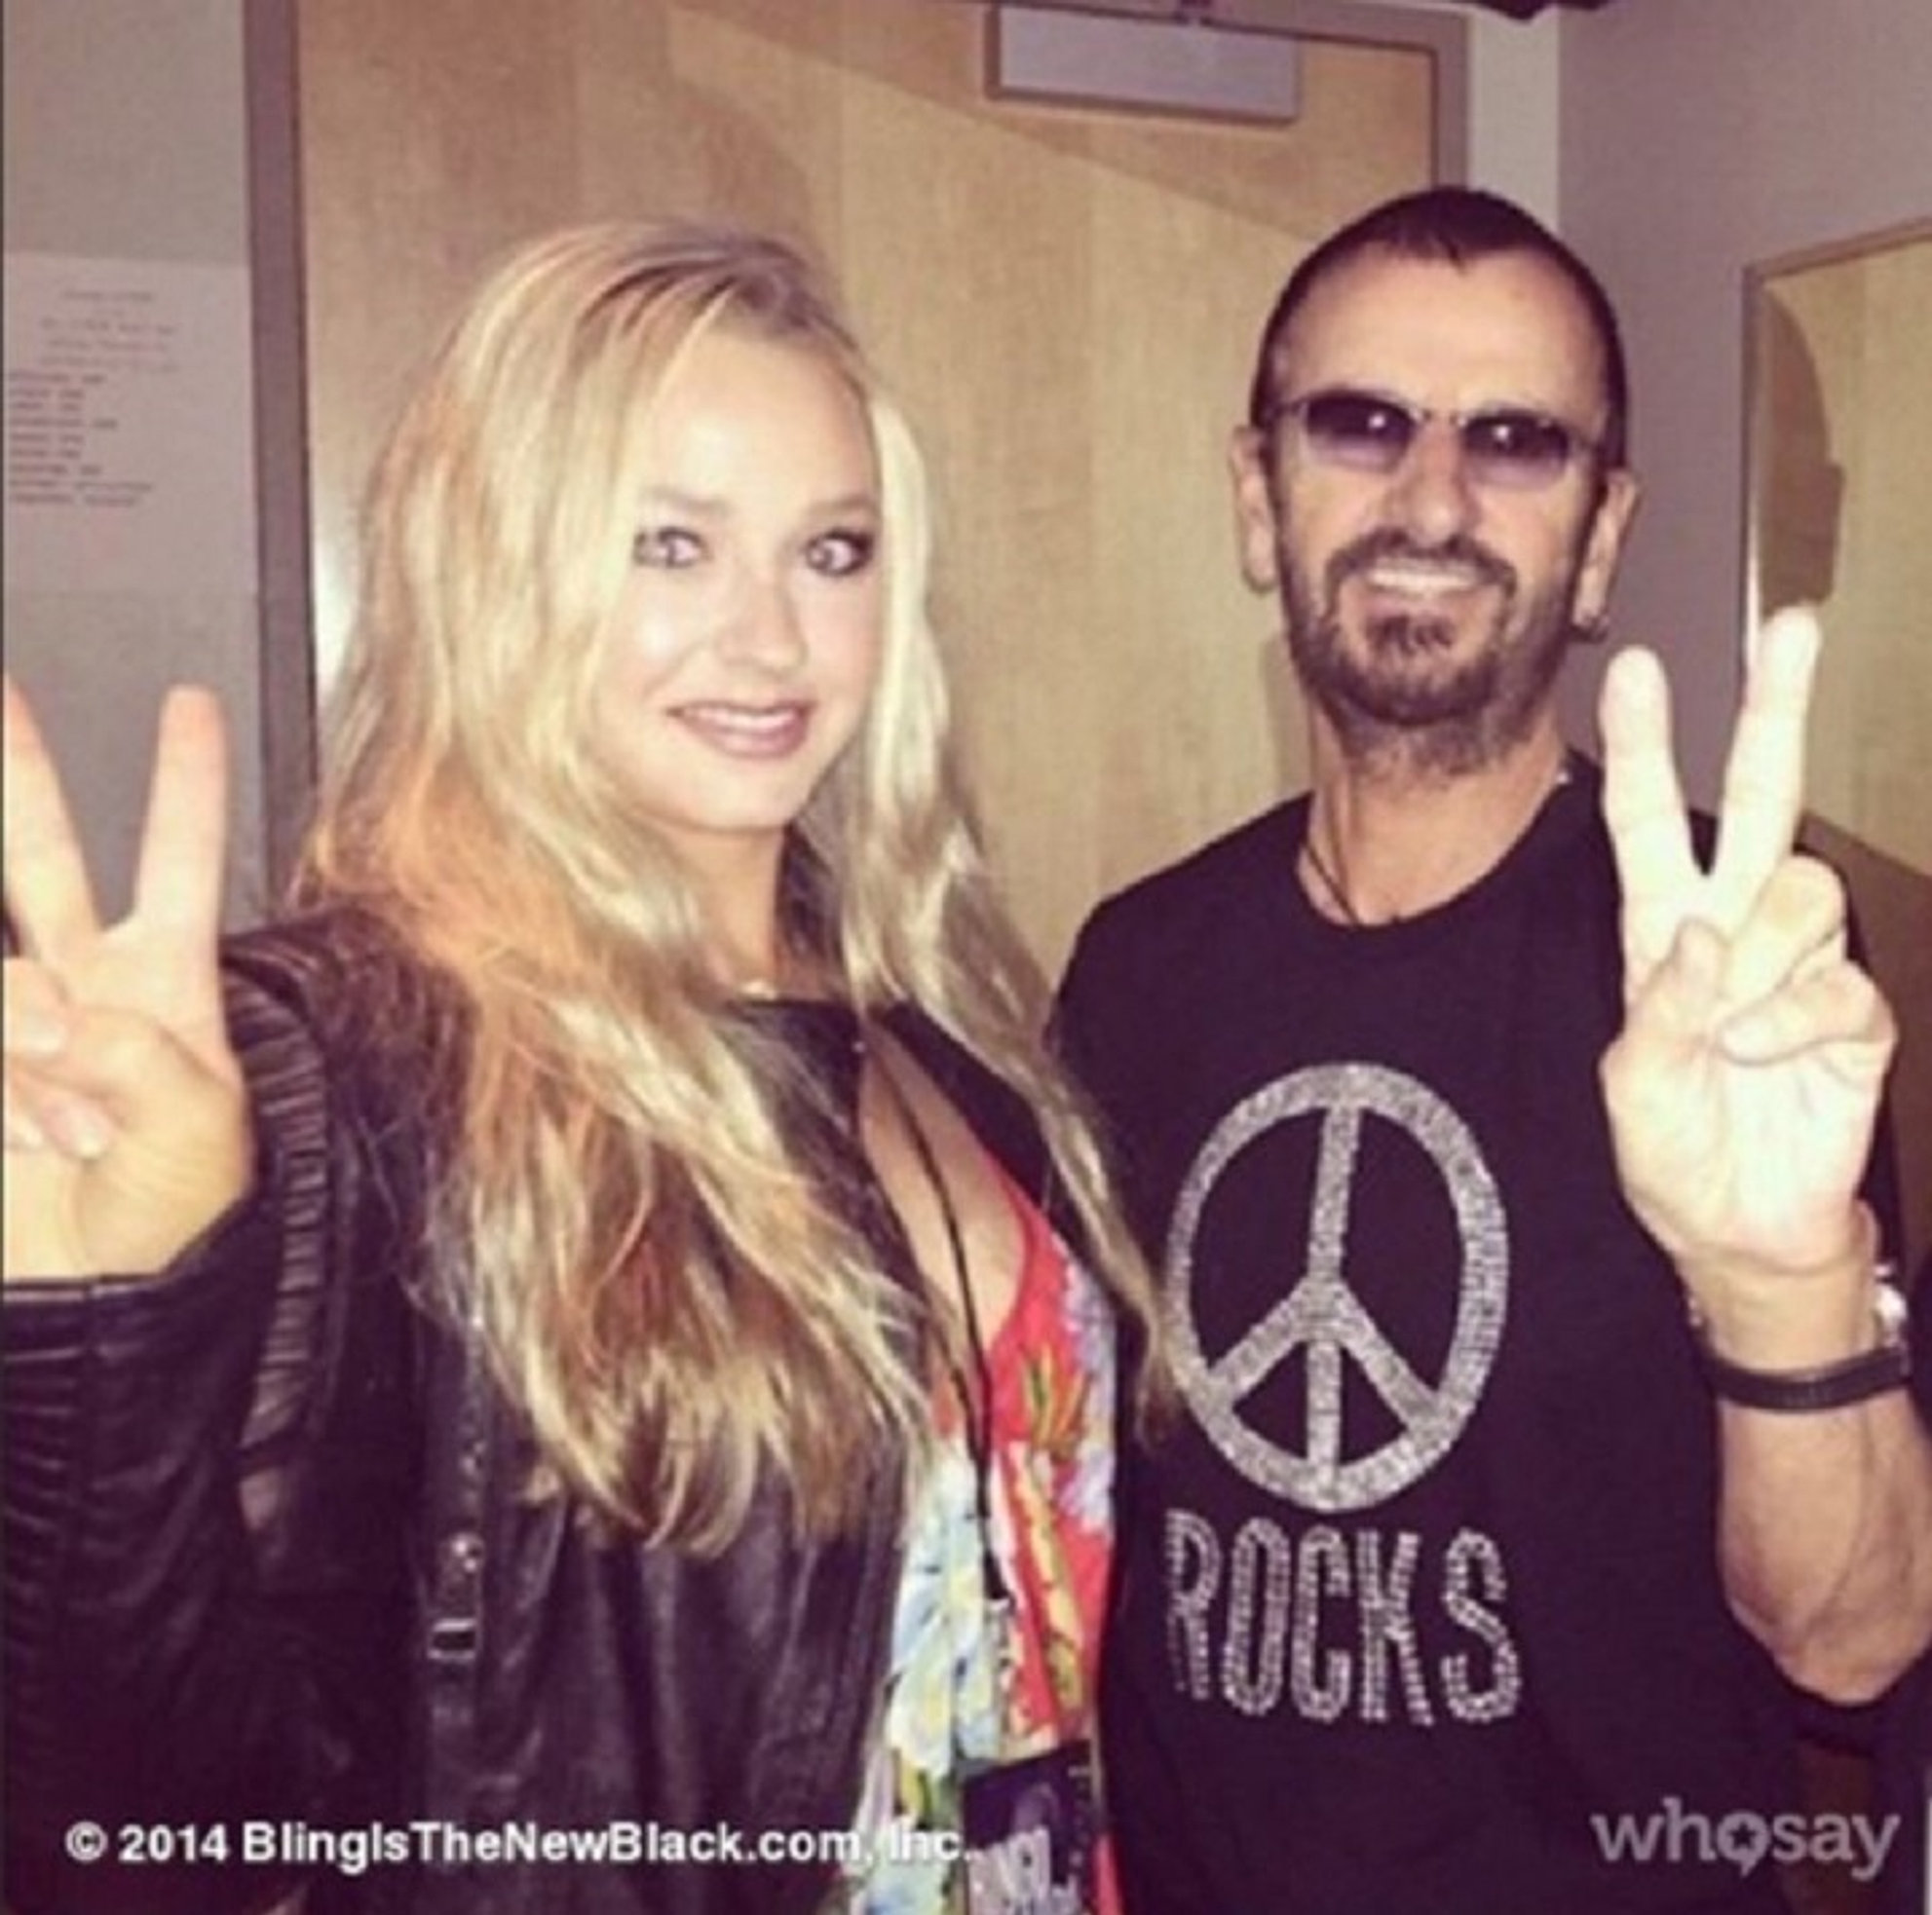 With Ringo Starr